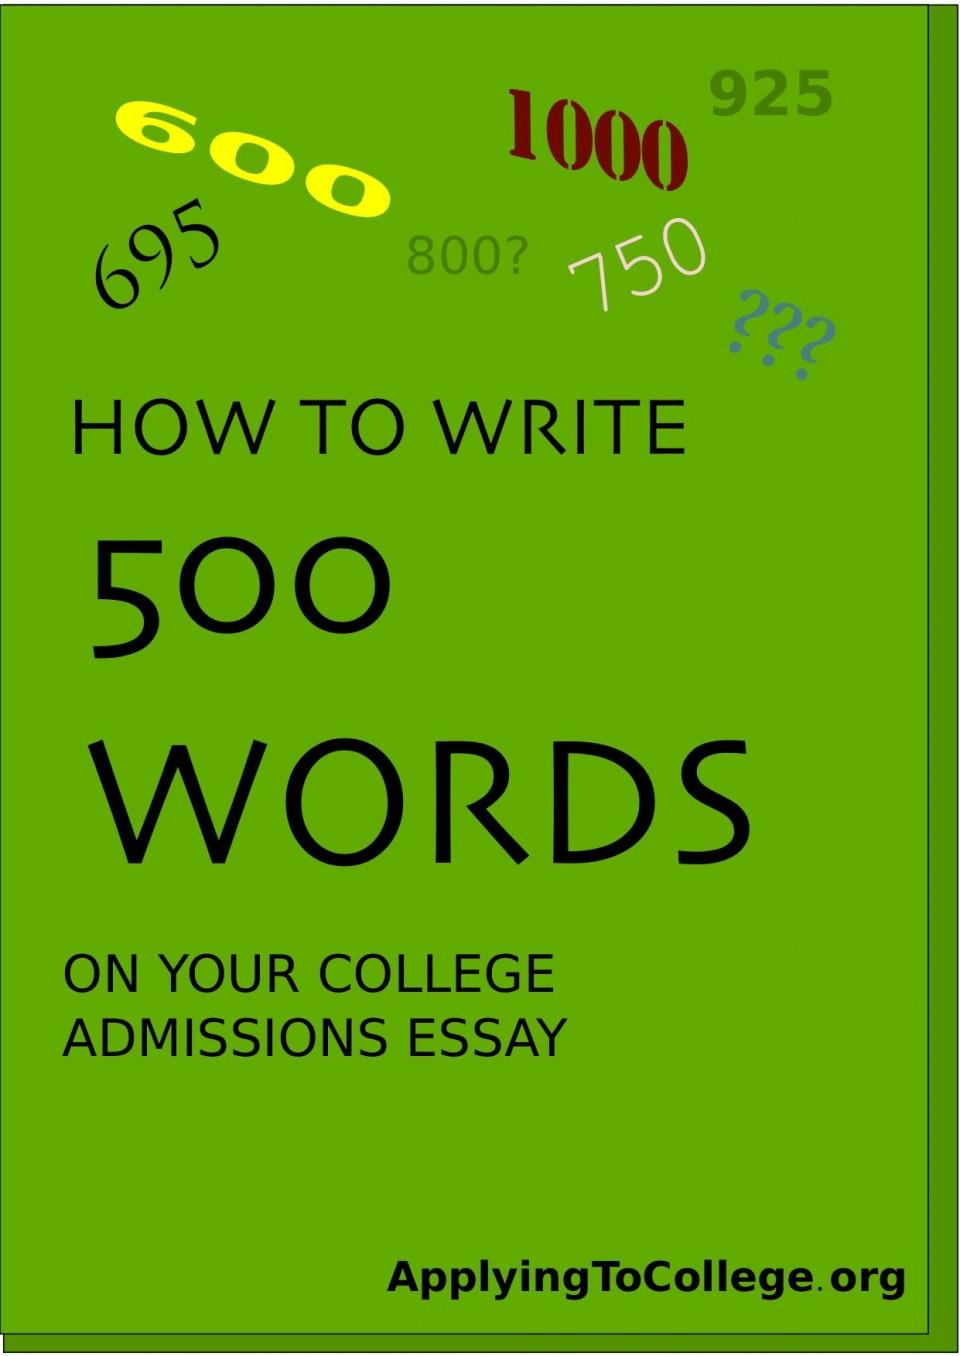 005 Essay Example College Word Impressive Limit Apply Texas 2019 960